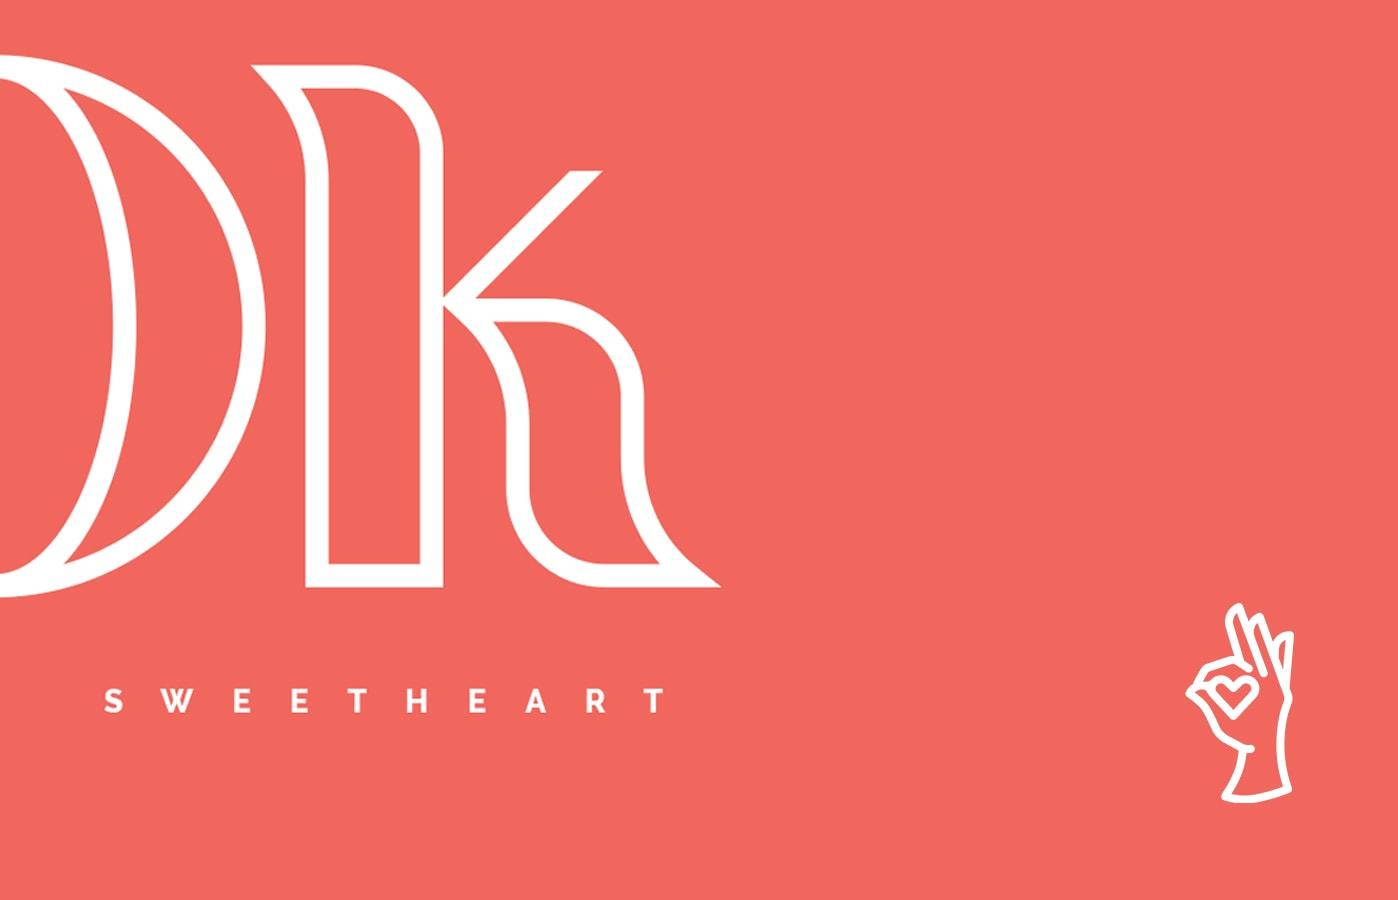 OK SWEETHEART logo